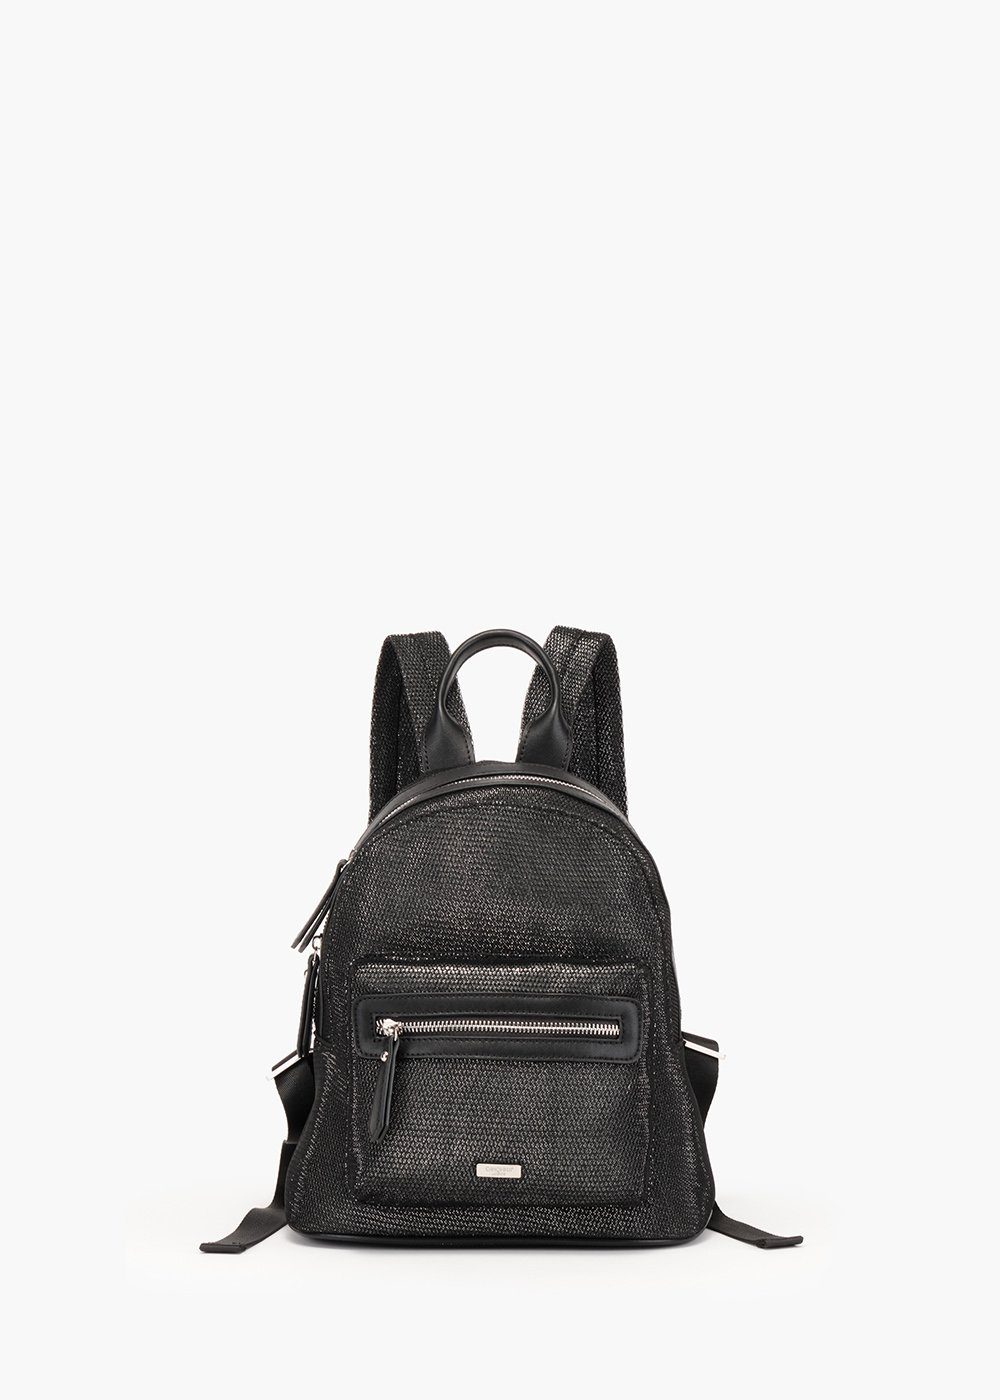 Basyl backpack in micromesh - Black / Silver - Woman